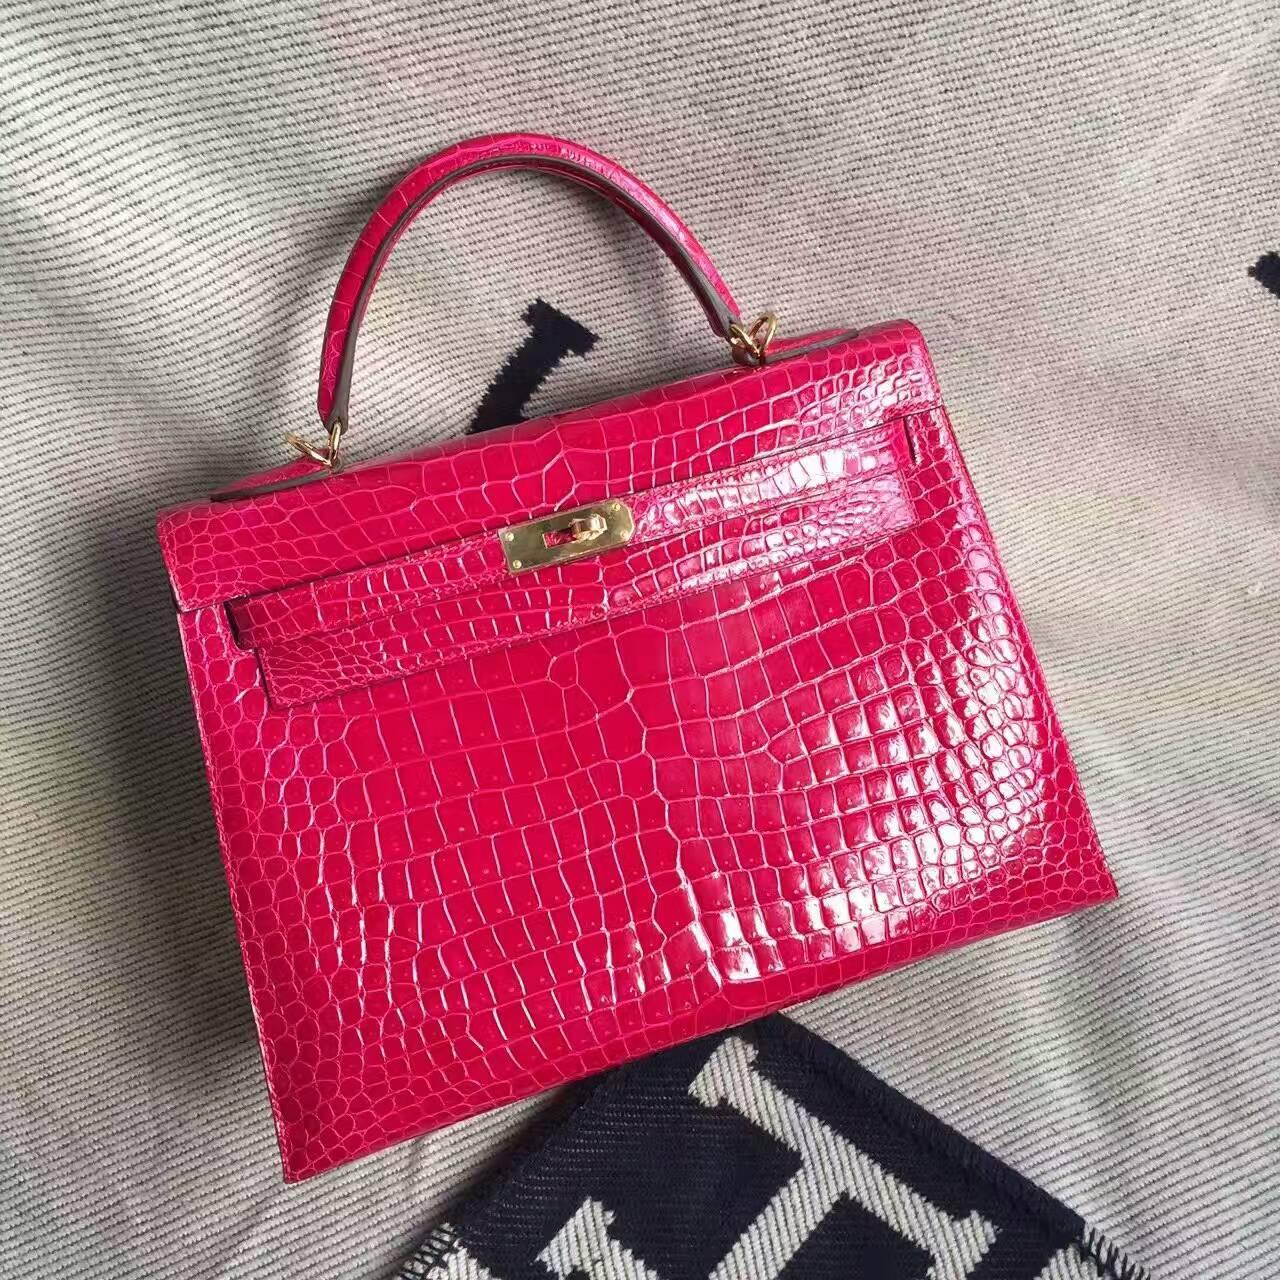 Noble Hermes Crocodile Shiny Leather Kelly Bag32cm in  J5 Rose Scheherazade